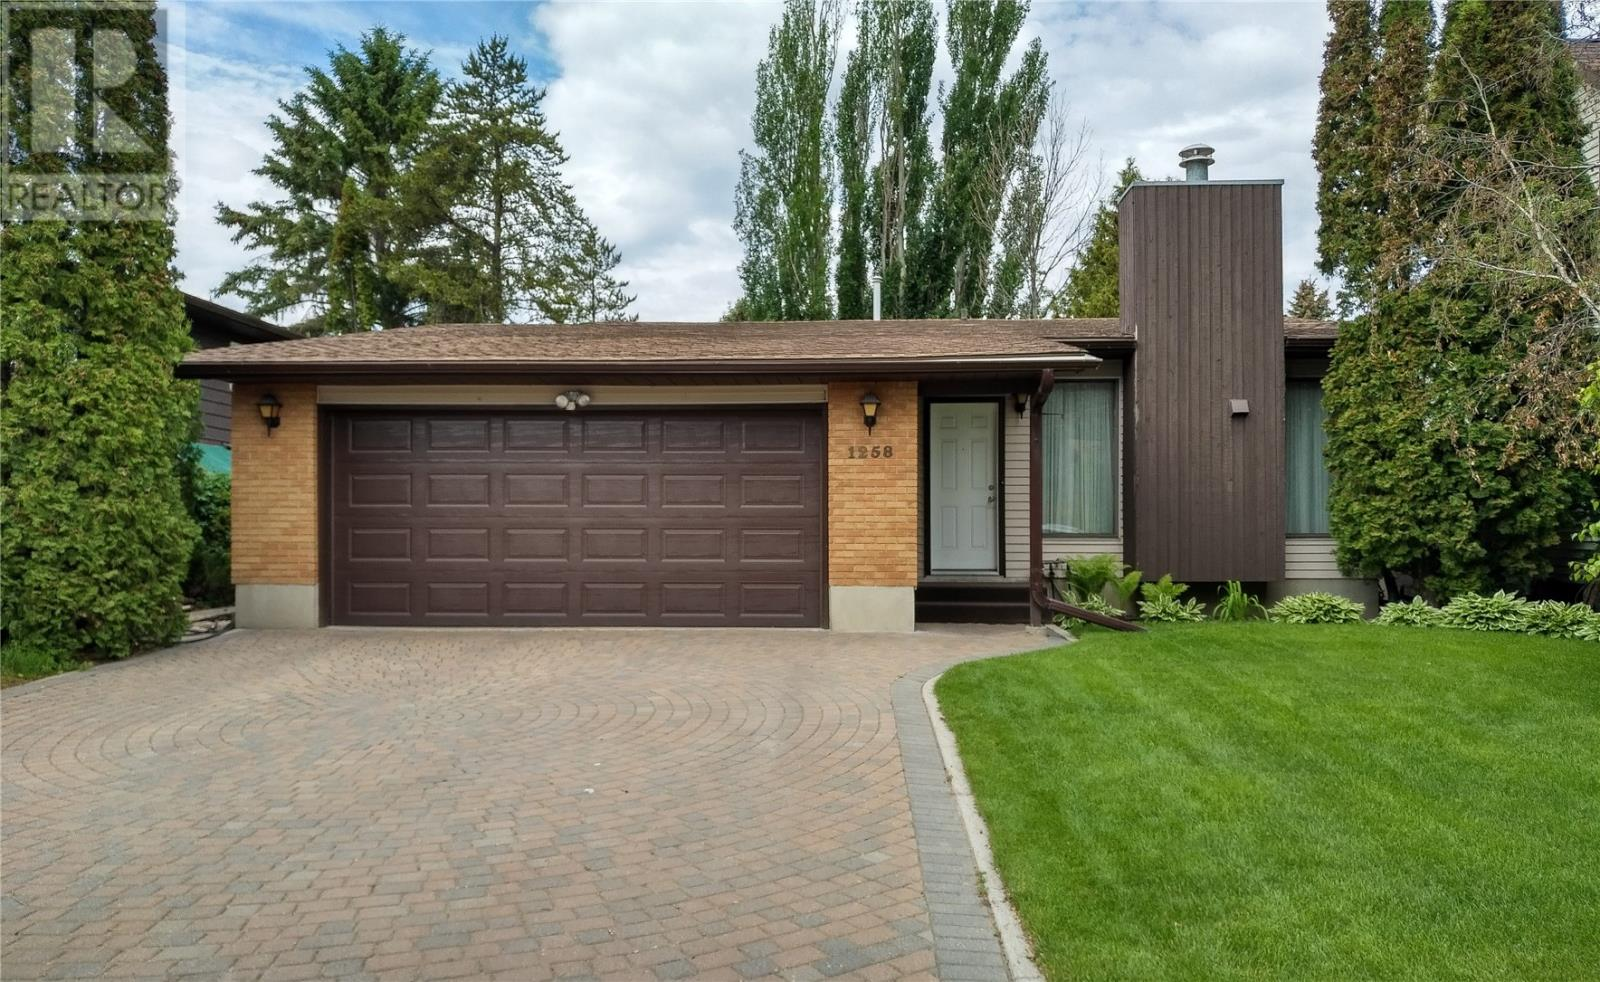 Removed: 1258 Emerald Crescent, Saskatoon, SK - Removed on 2019-06-30 17:12:05